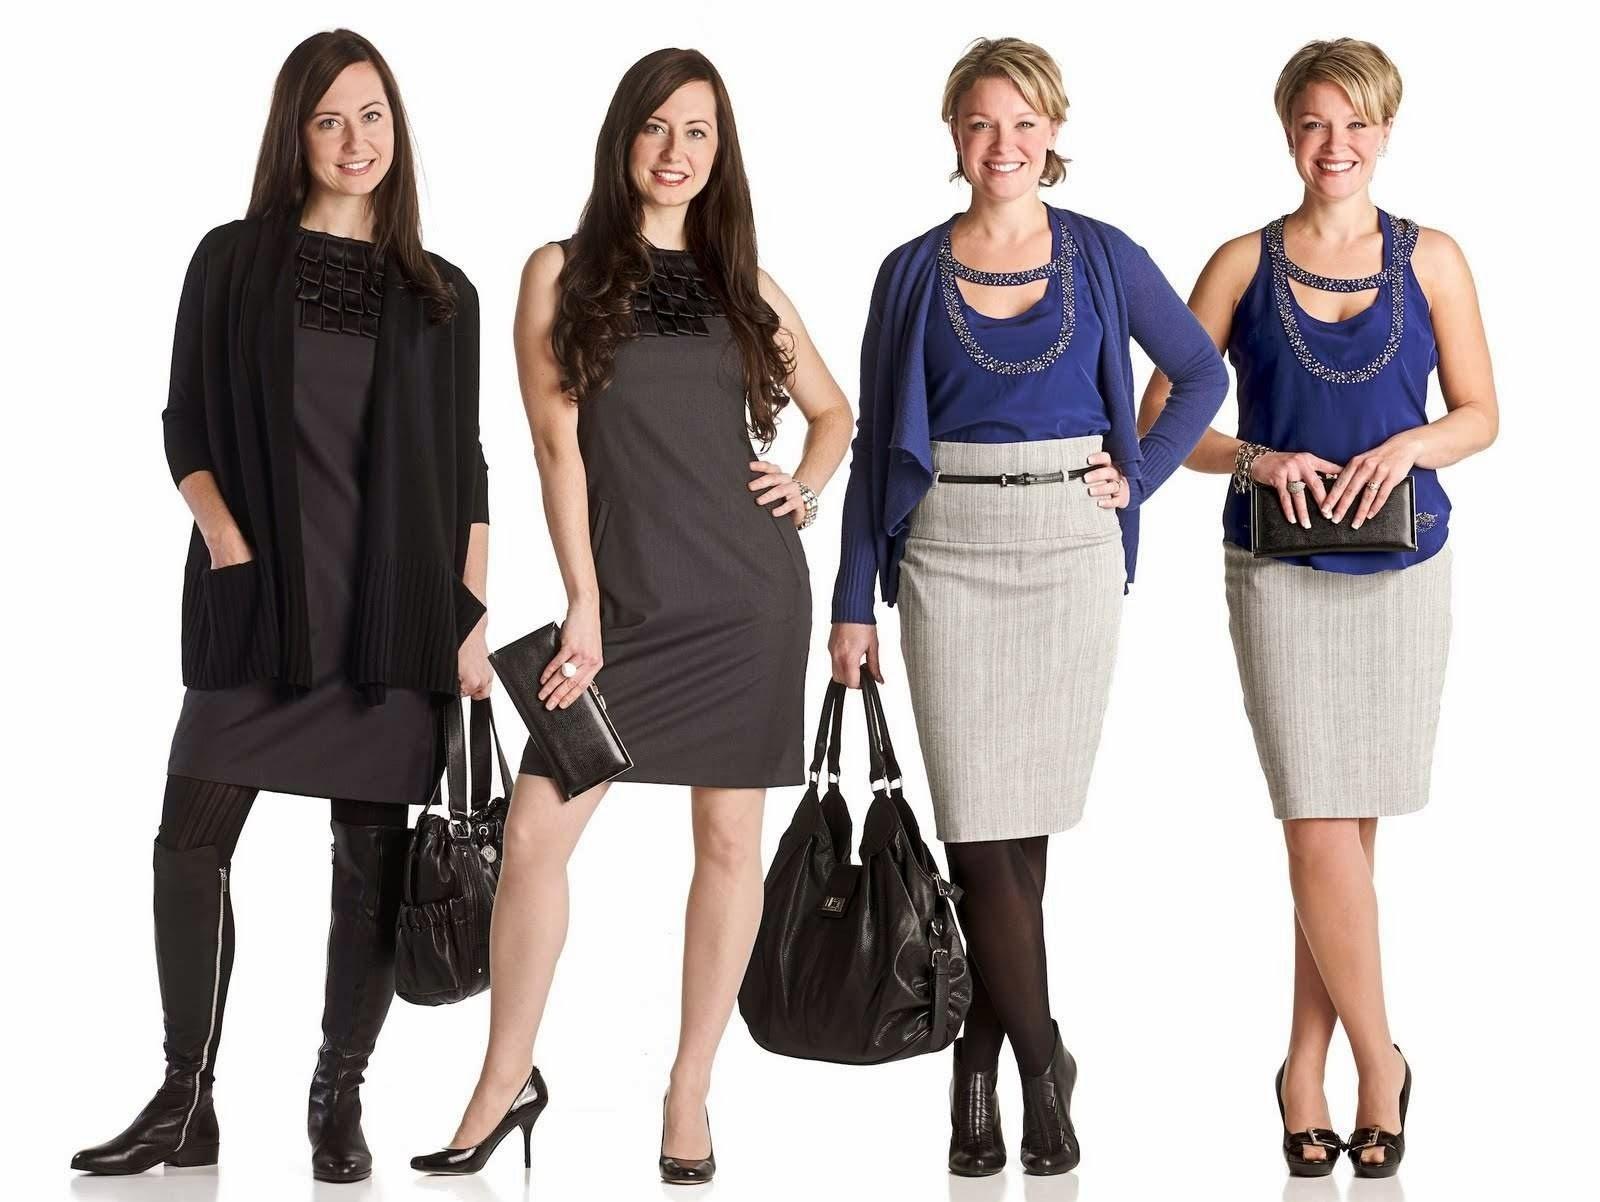 41e5774a31 Women s Fashion World  Women s Clothing 2014 Dresses Bags Shoes ...